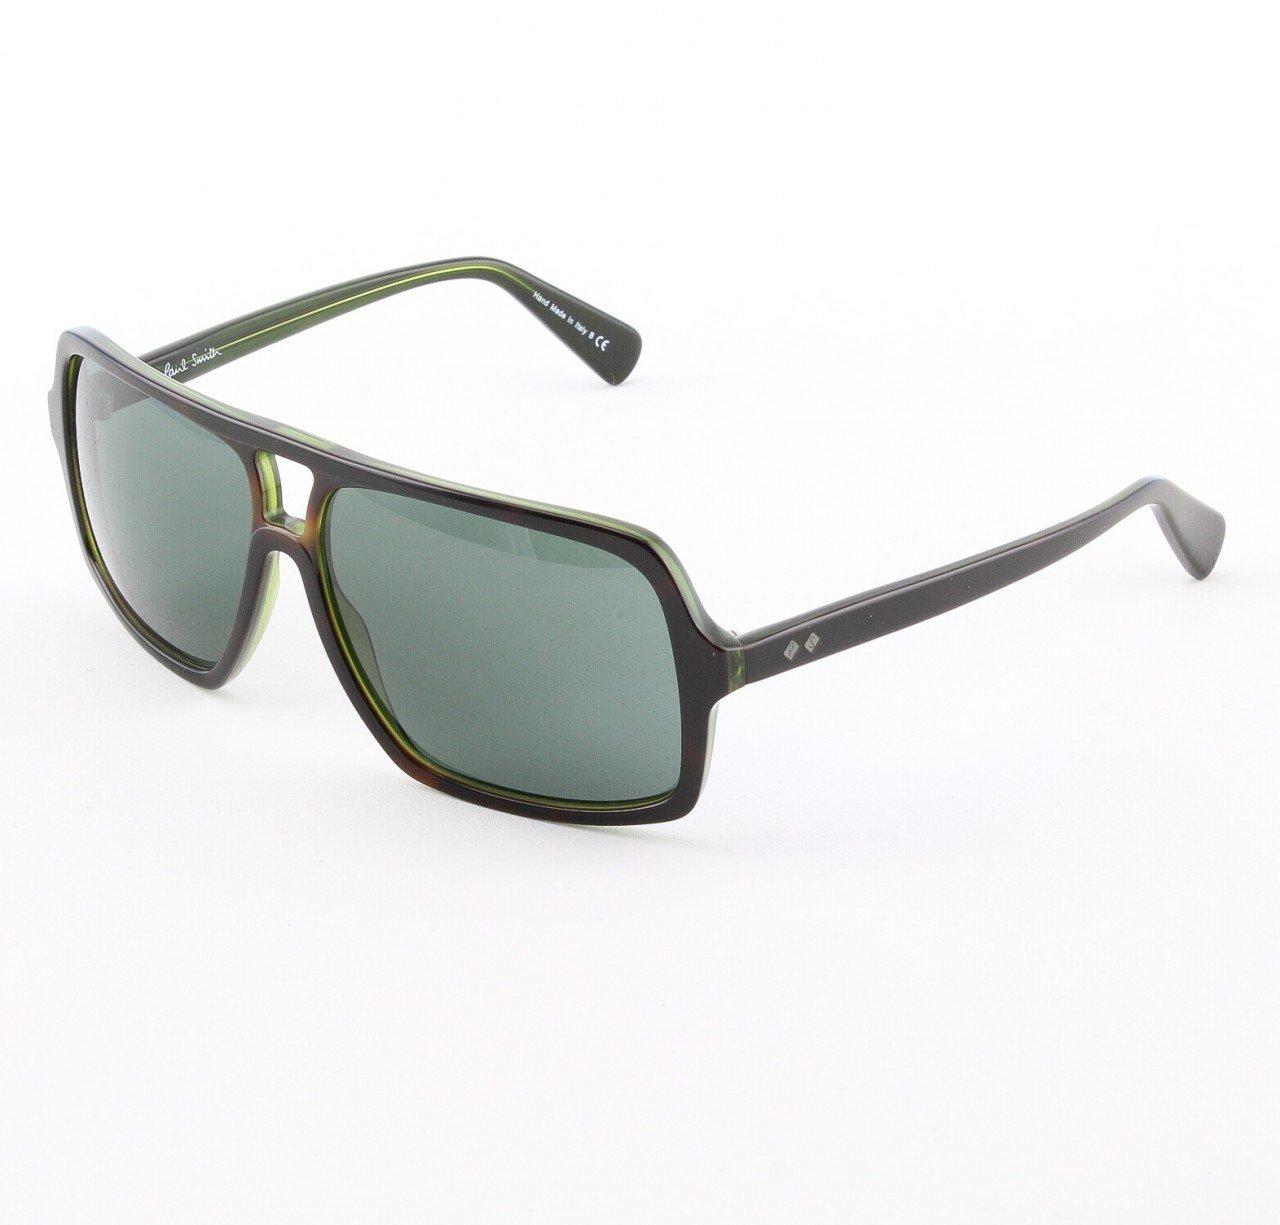 Paul Smith Waller 8082-S Sunglasses Color Dark Green Brown with Dark Grey Lenses